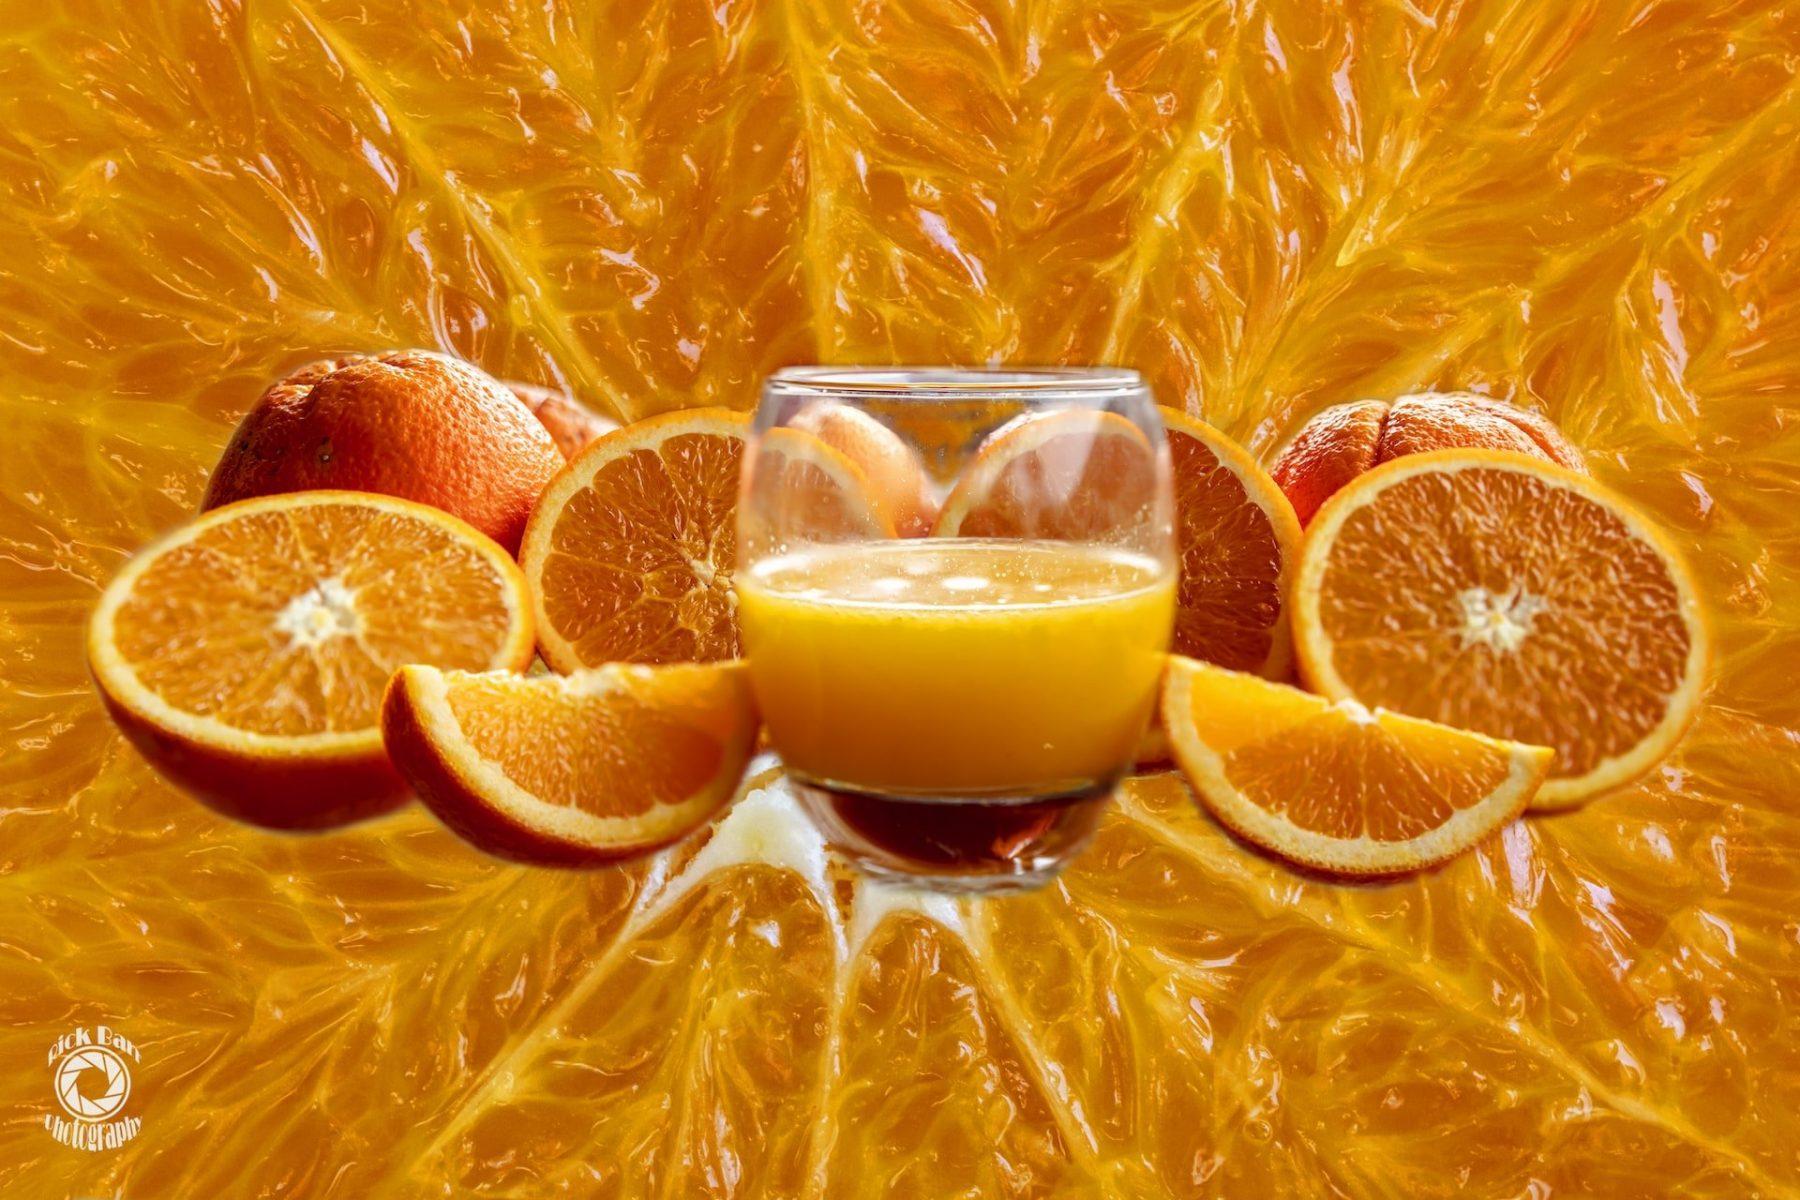 Rick Barr - Fresh Juice